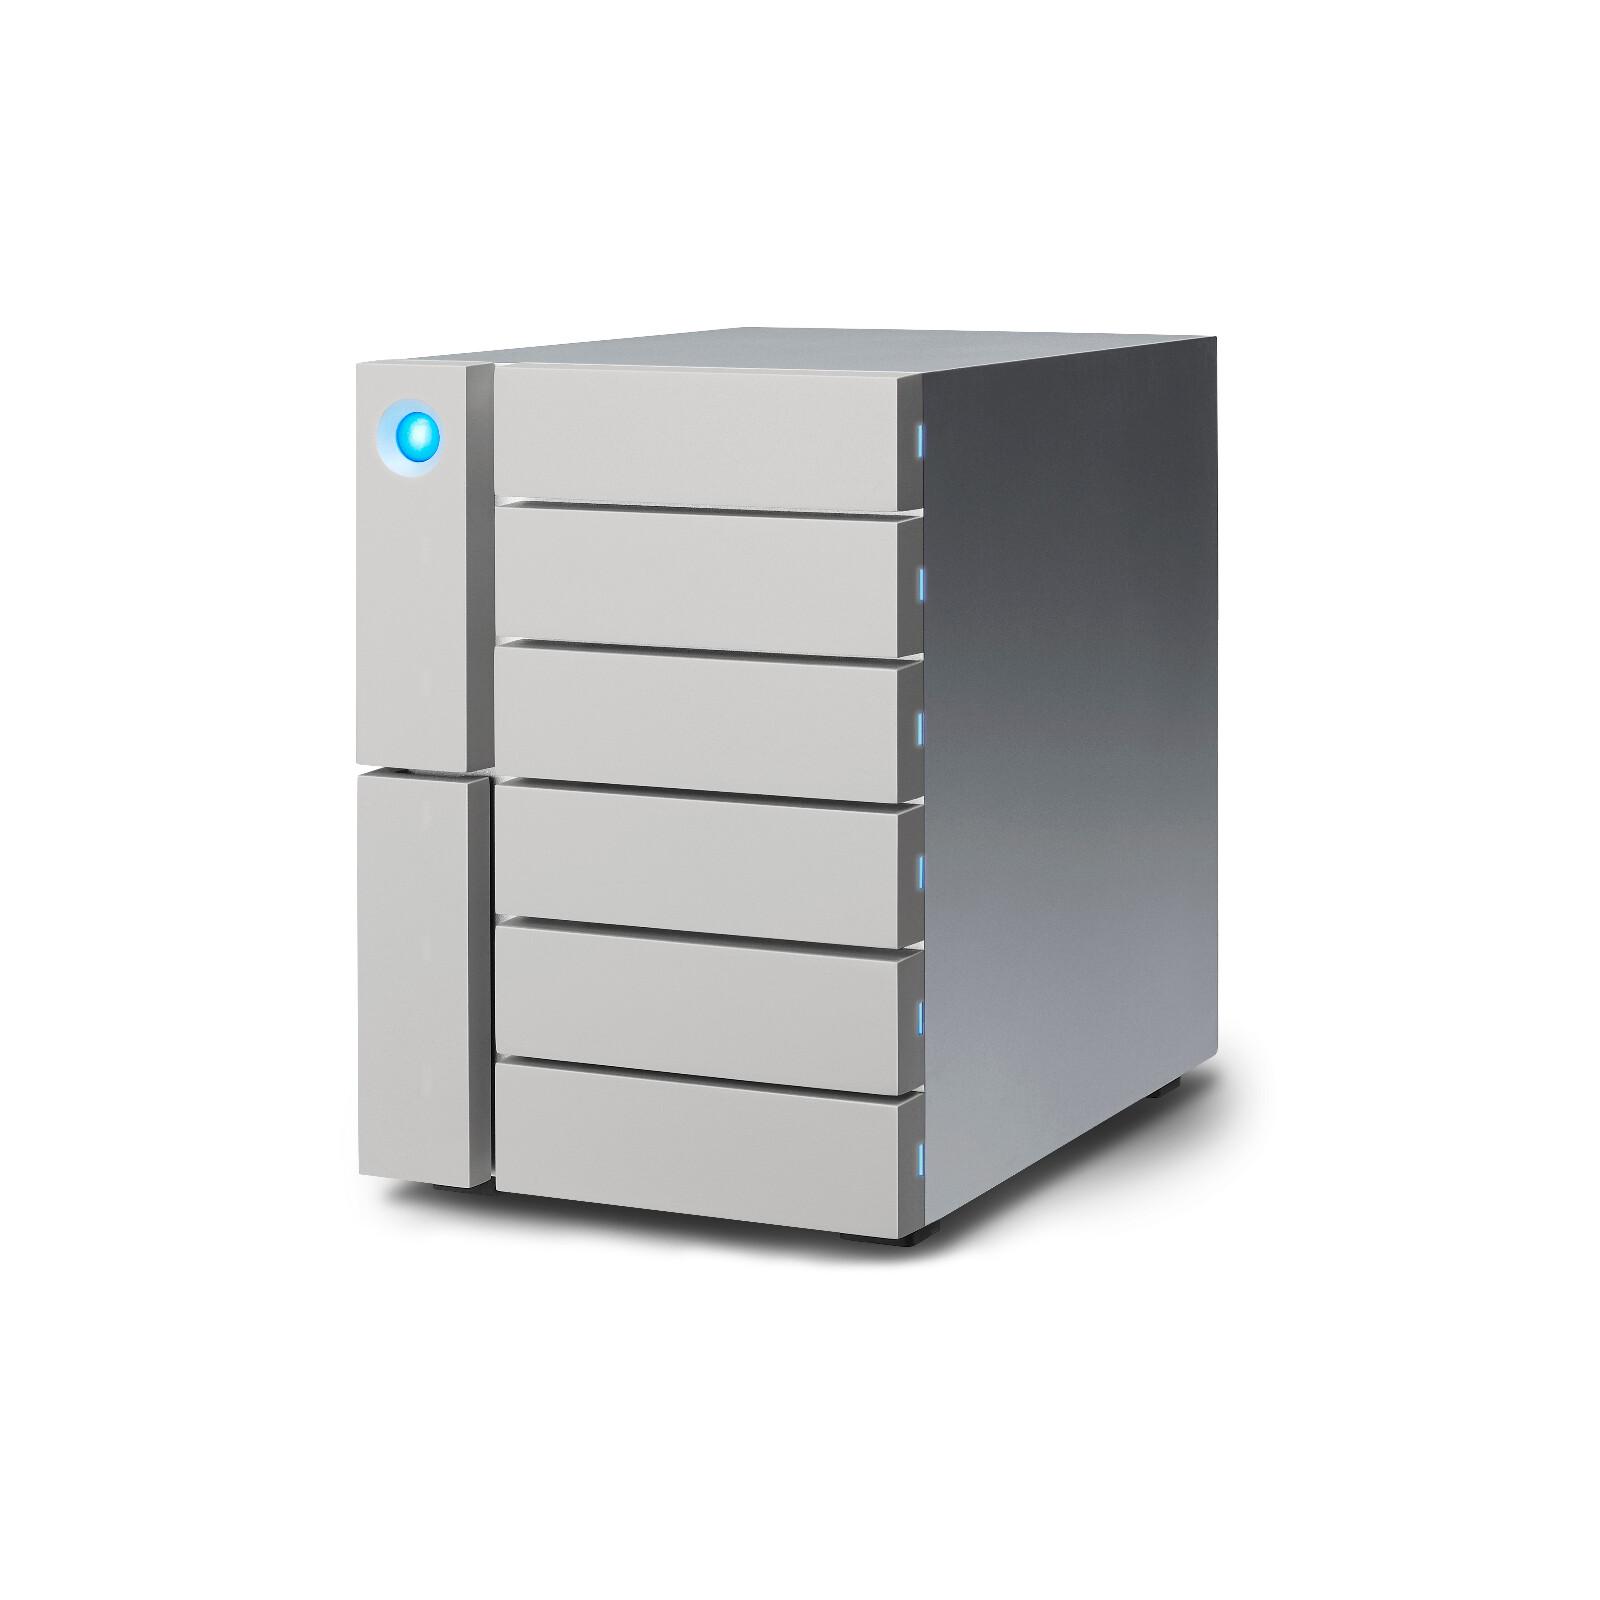 LaCie 6big 24TB Thunderbolt 3 Desktop RAID Storage